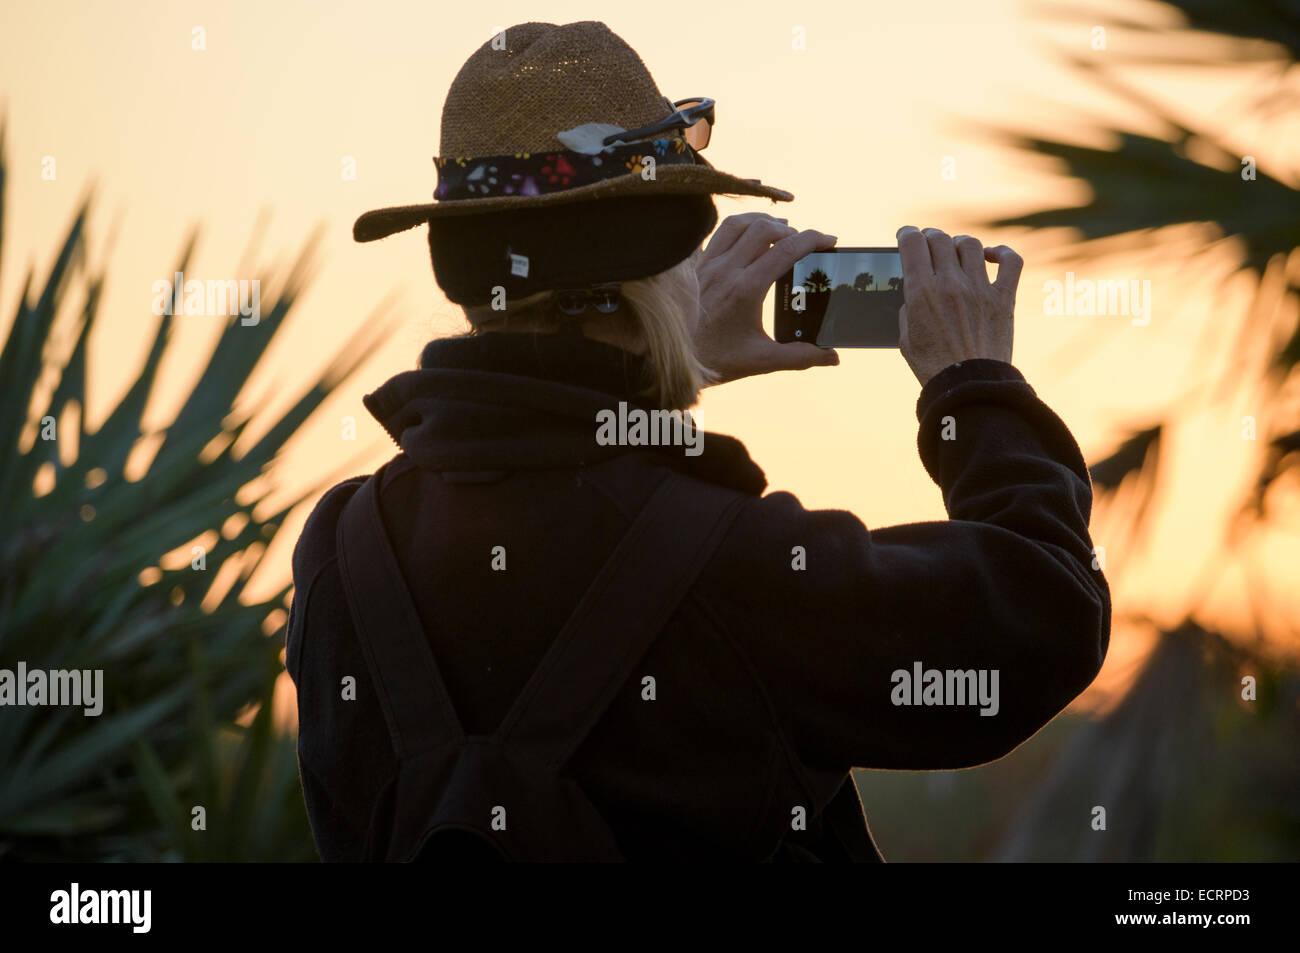 Reife Frau Foto mit Ihrem Smartphone Stockbild